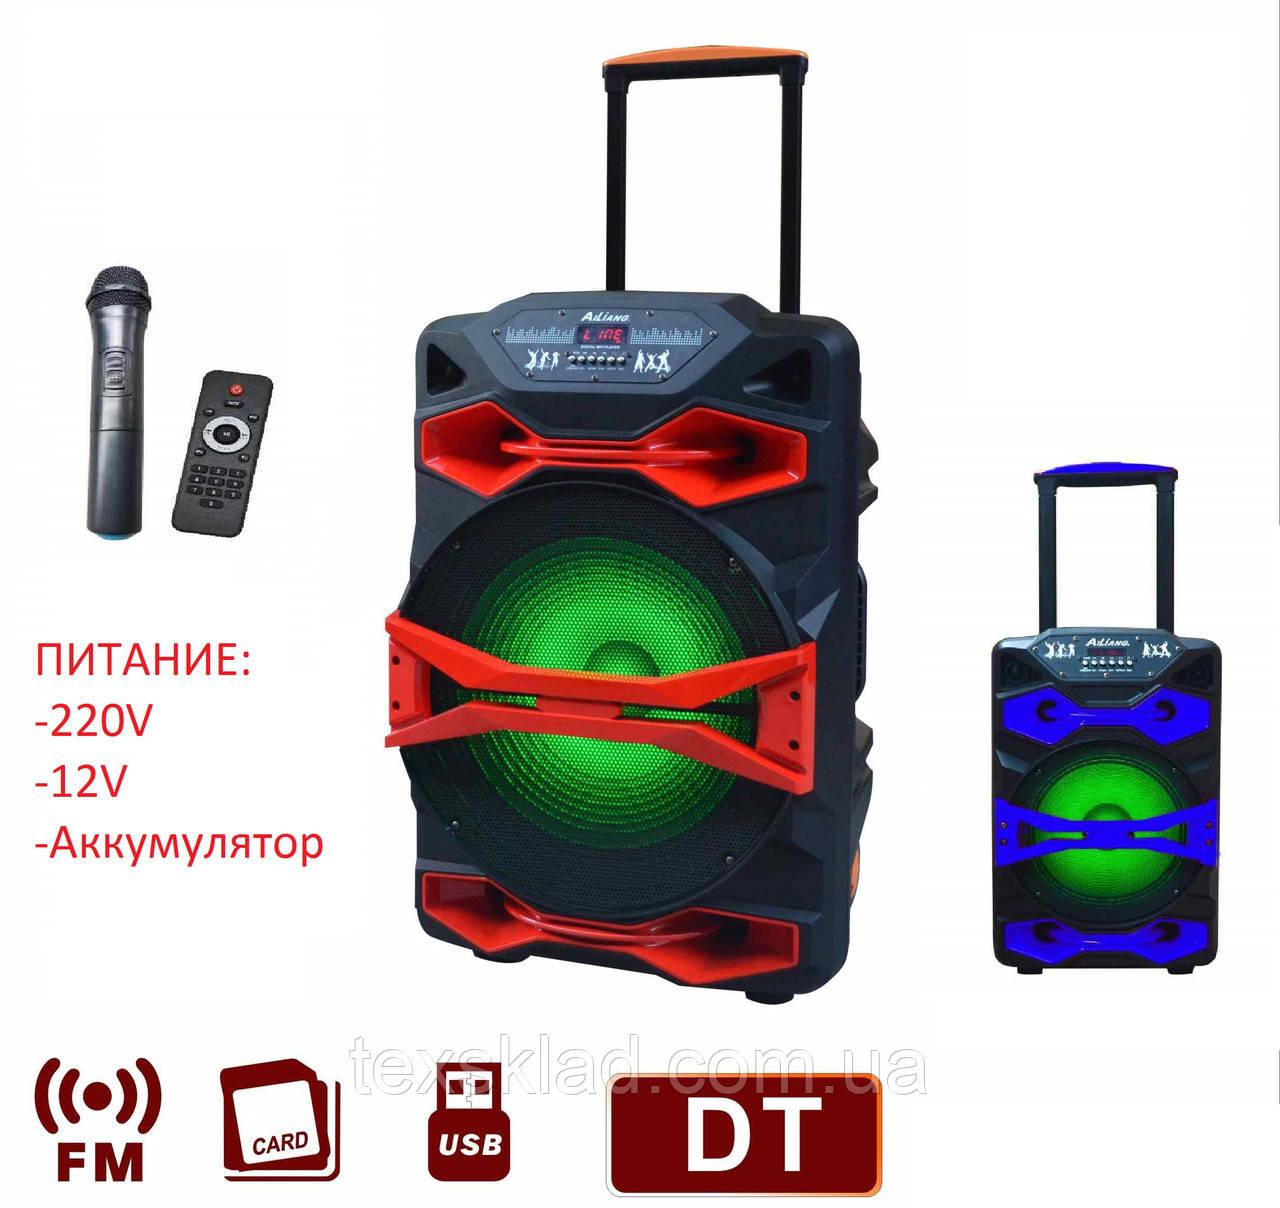 Акумуляторная колонка с микрофоном AIL-1218AK-DT 150W (FM/USB/Bluetooth)